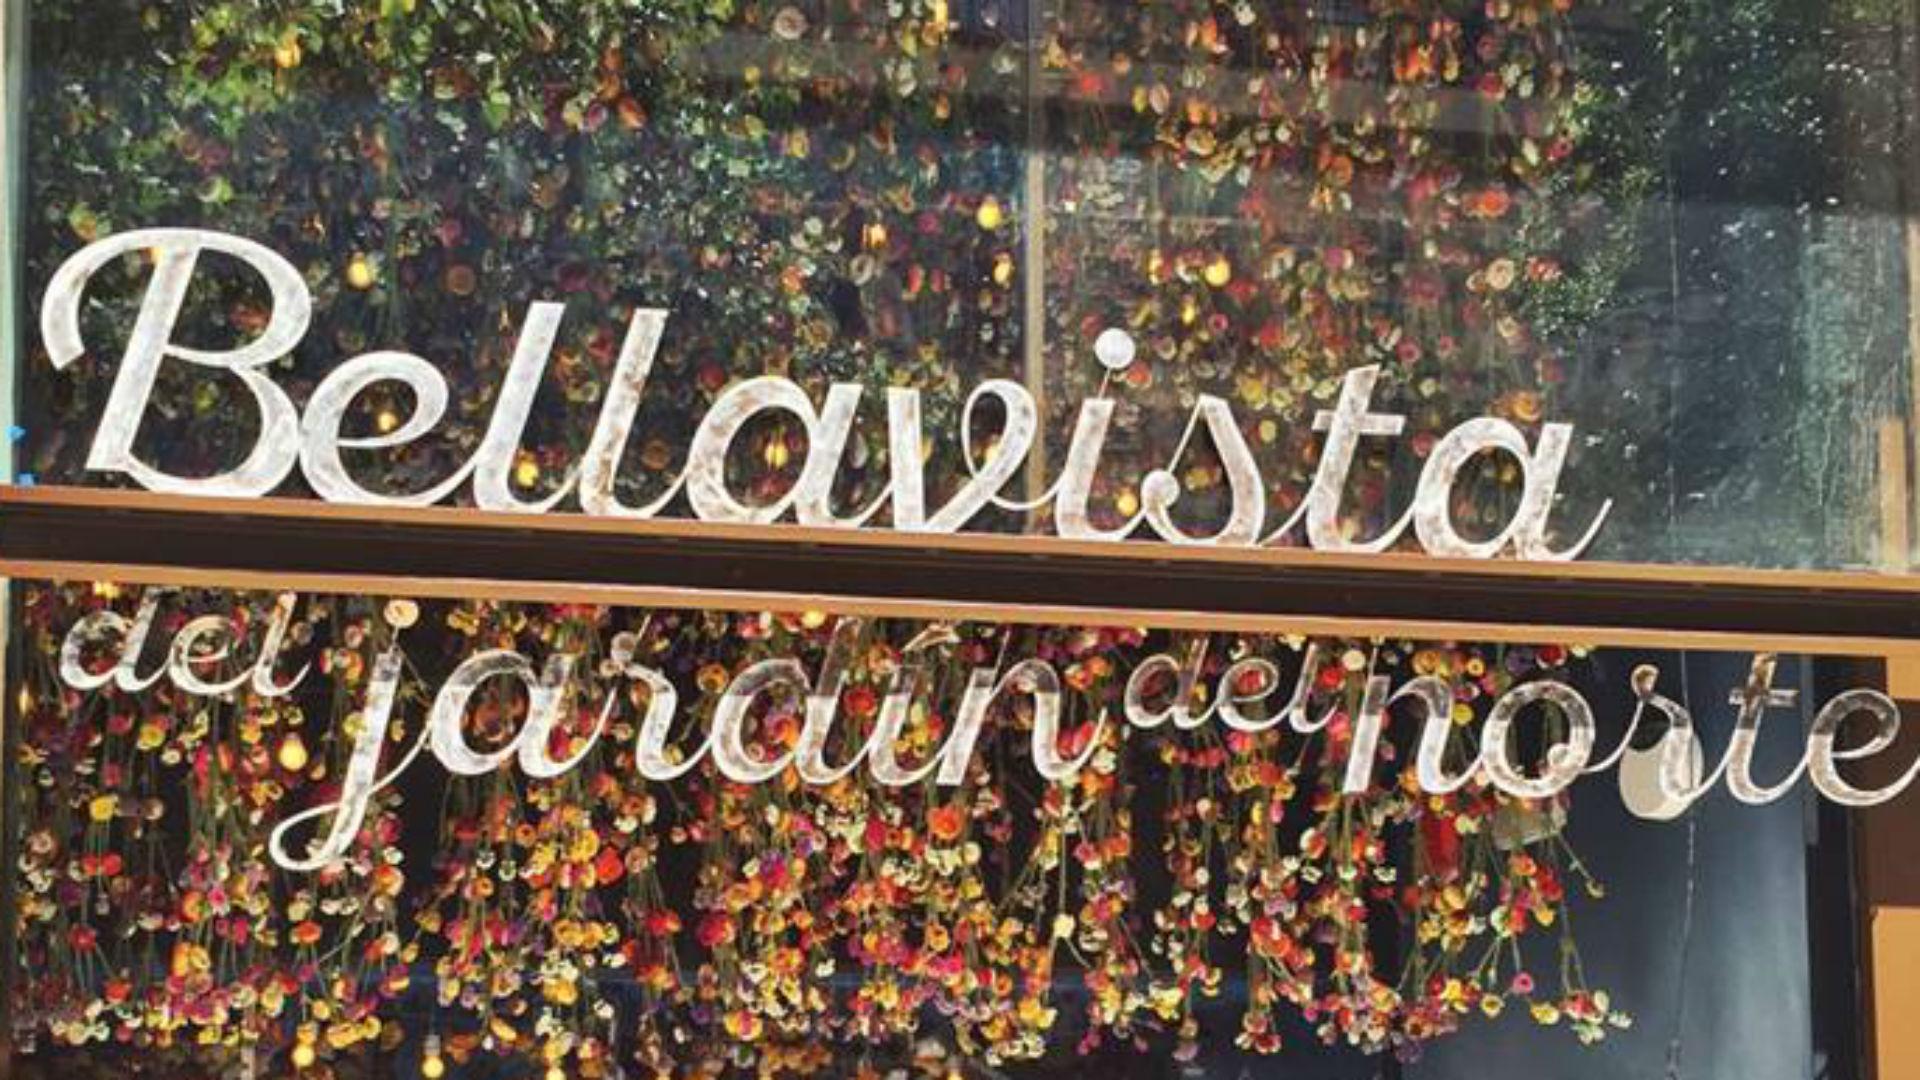 Bellavista del jardin del norte restaurant lionel messi for El bellavista del jardin del norte